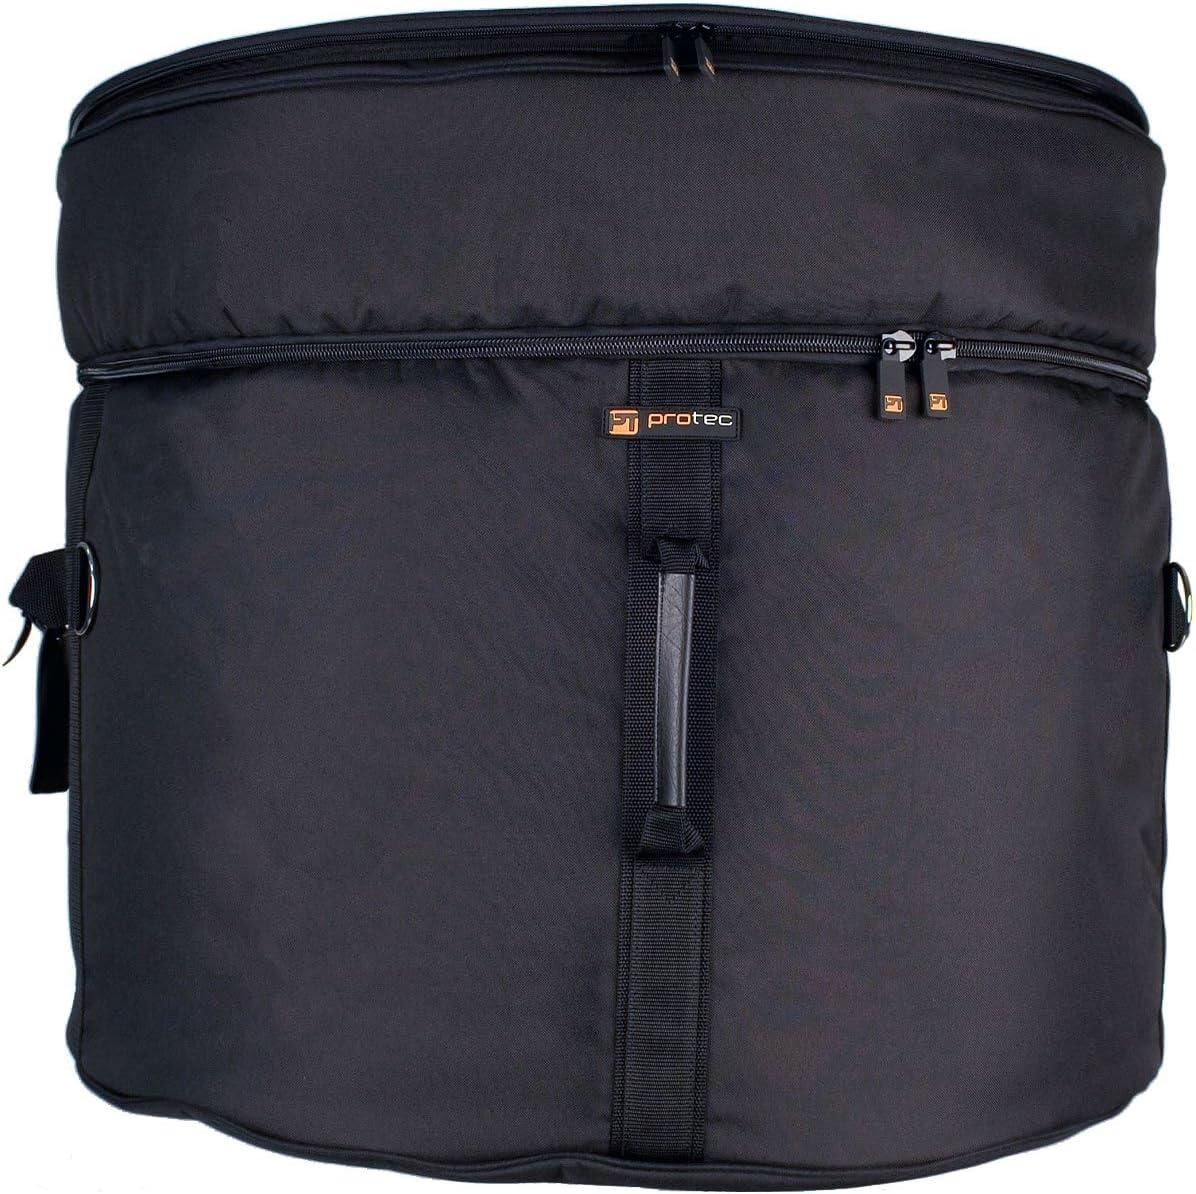 Protec 16 X 22 DELUXE DRUM BAG PADDED Max 43% Regular discount OFF KICK